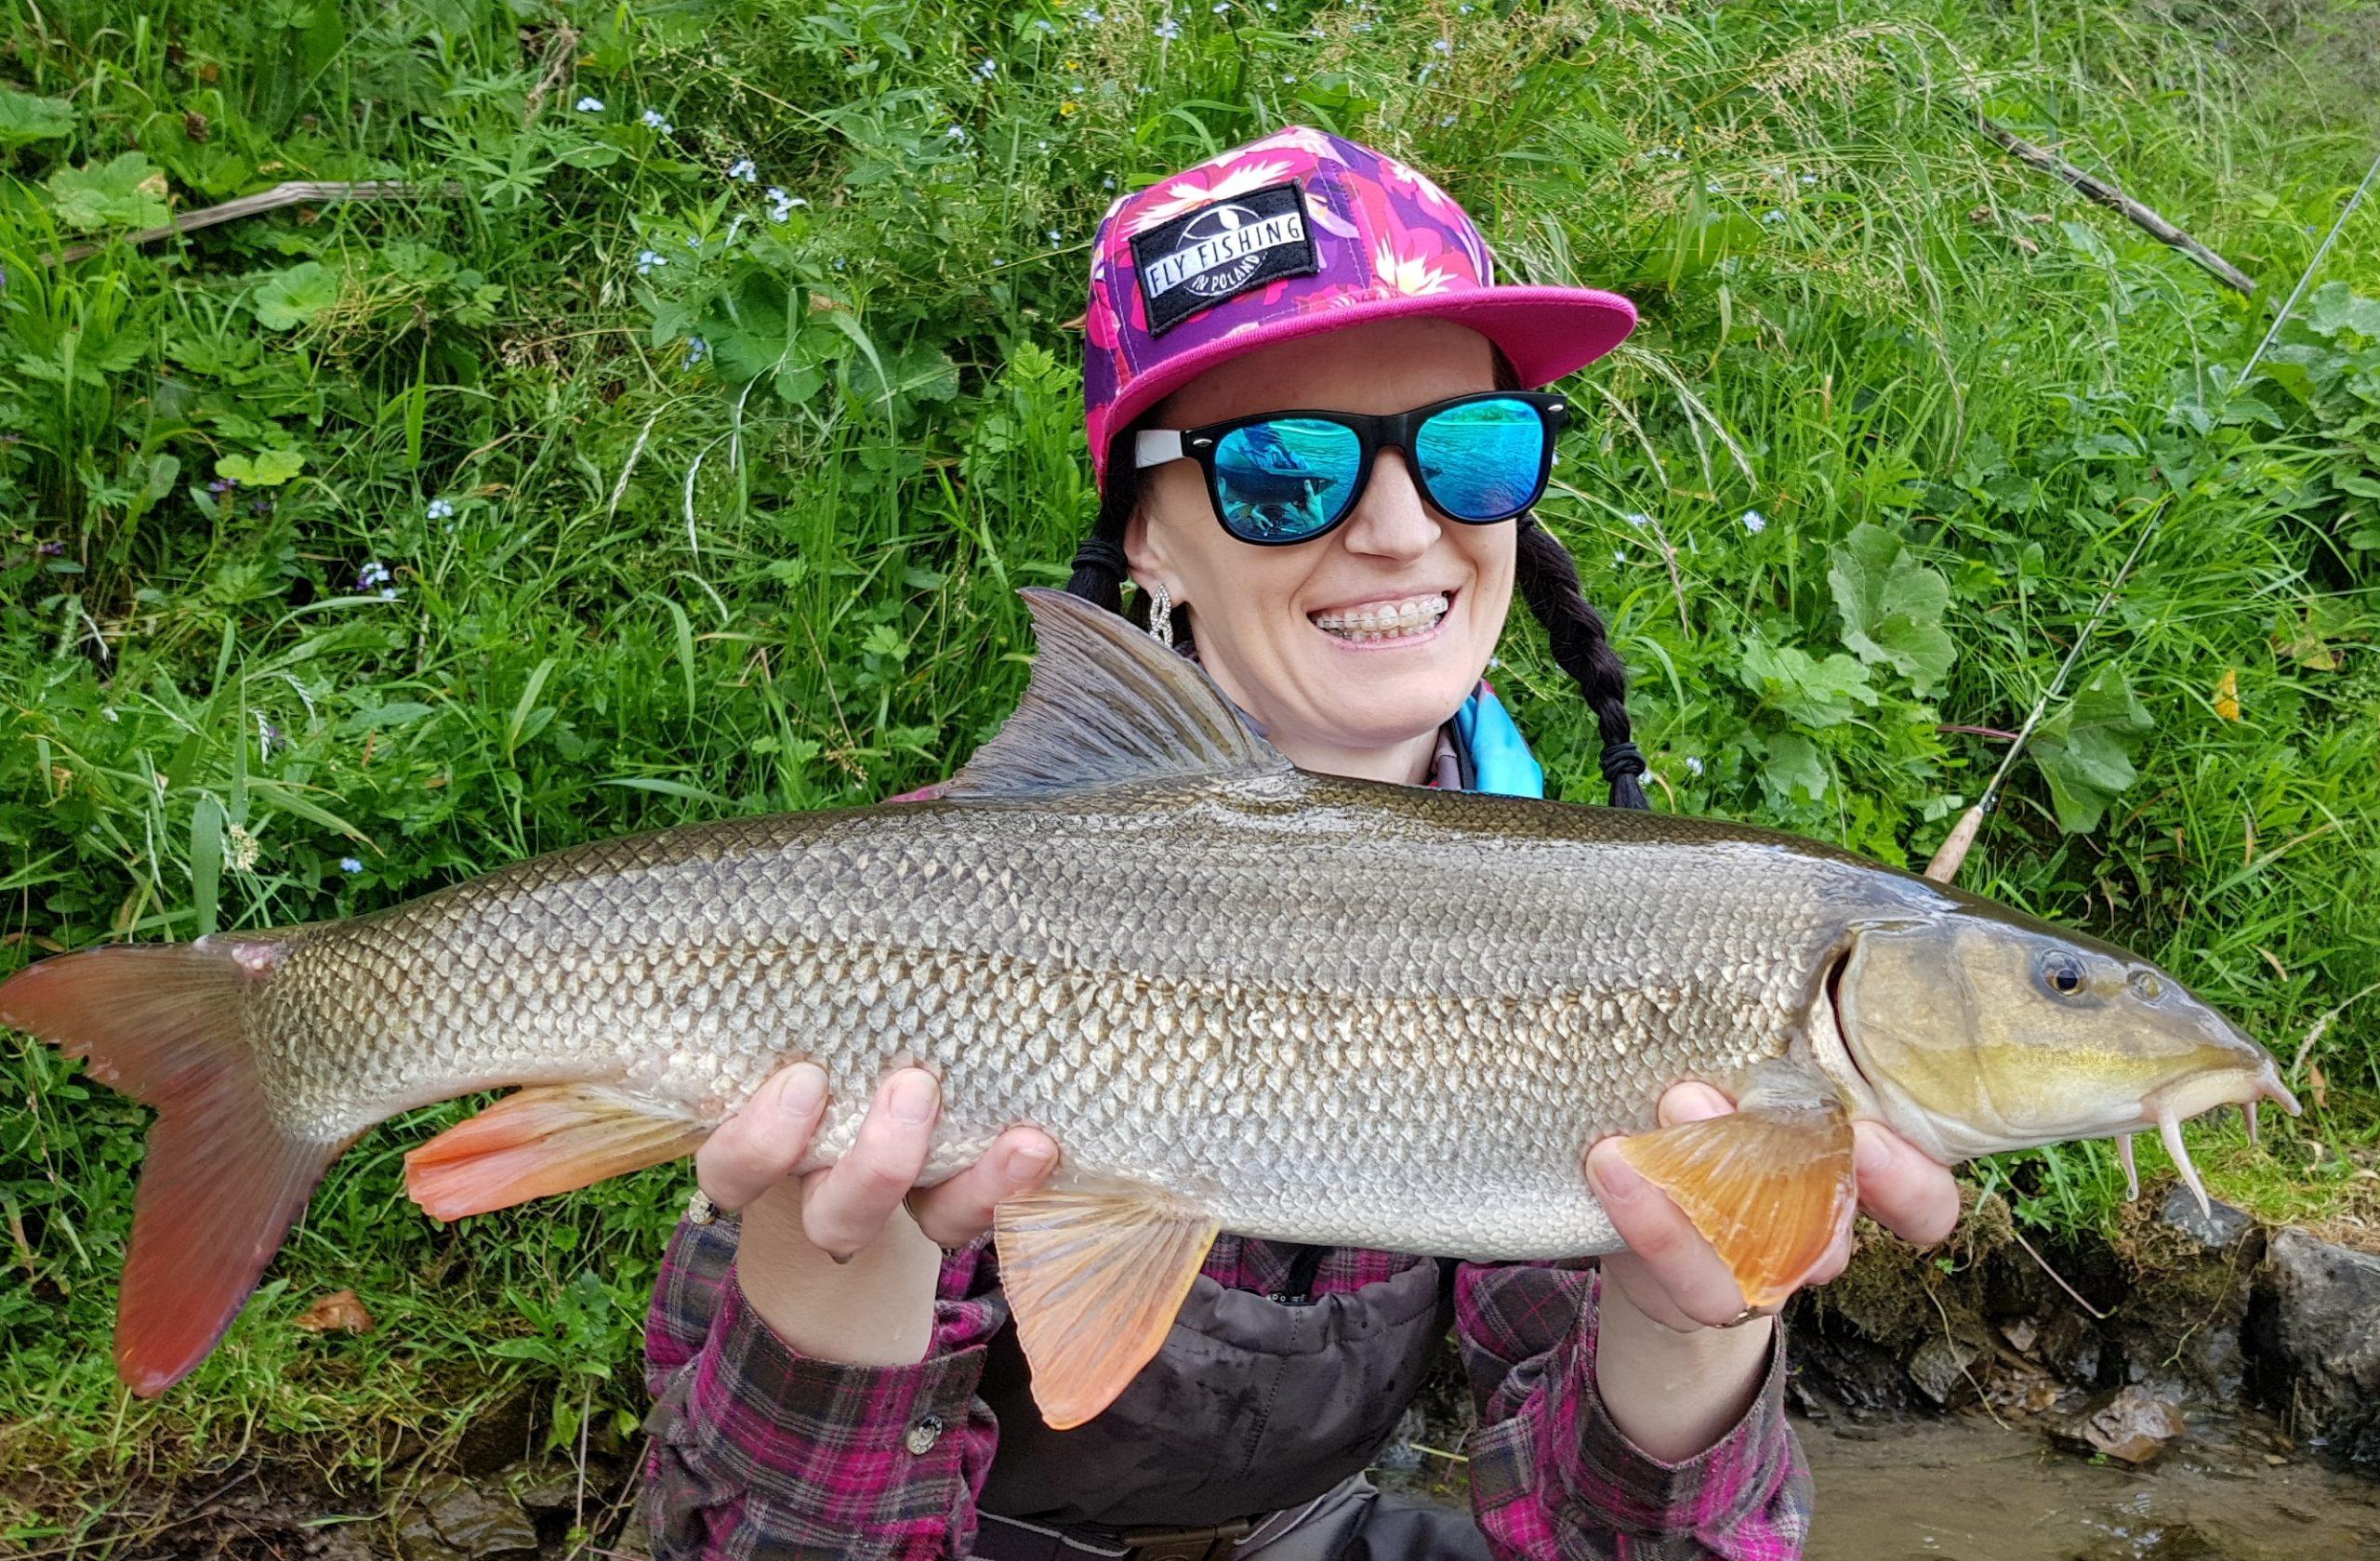 Nymph girl fishing Poland